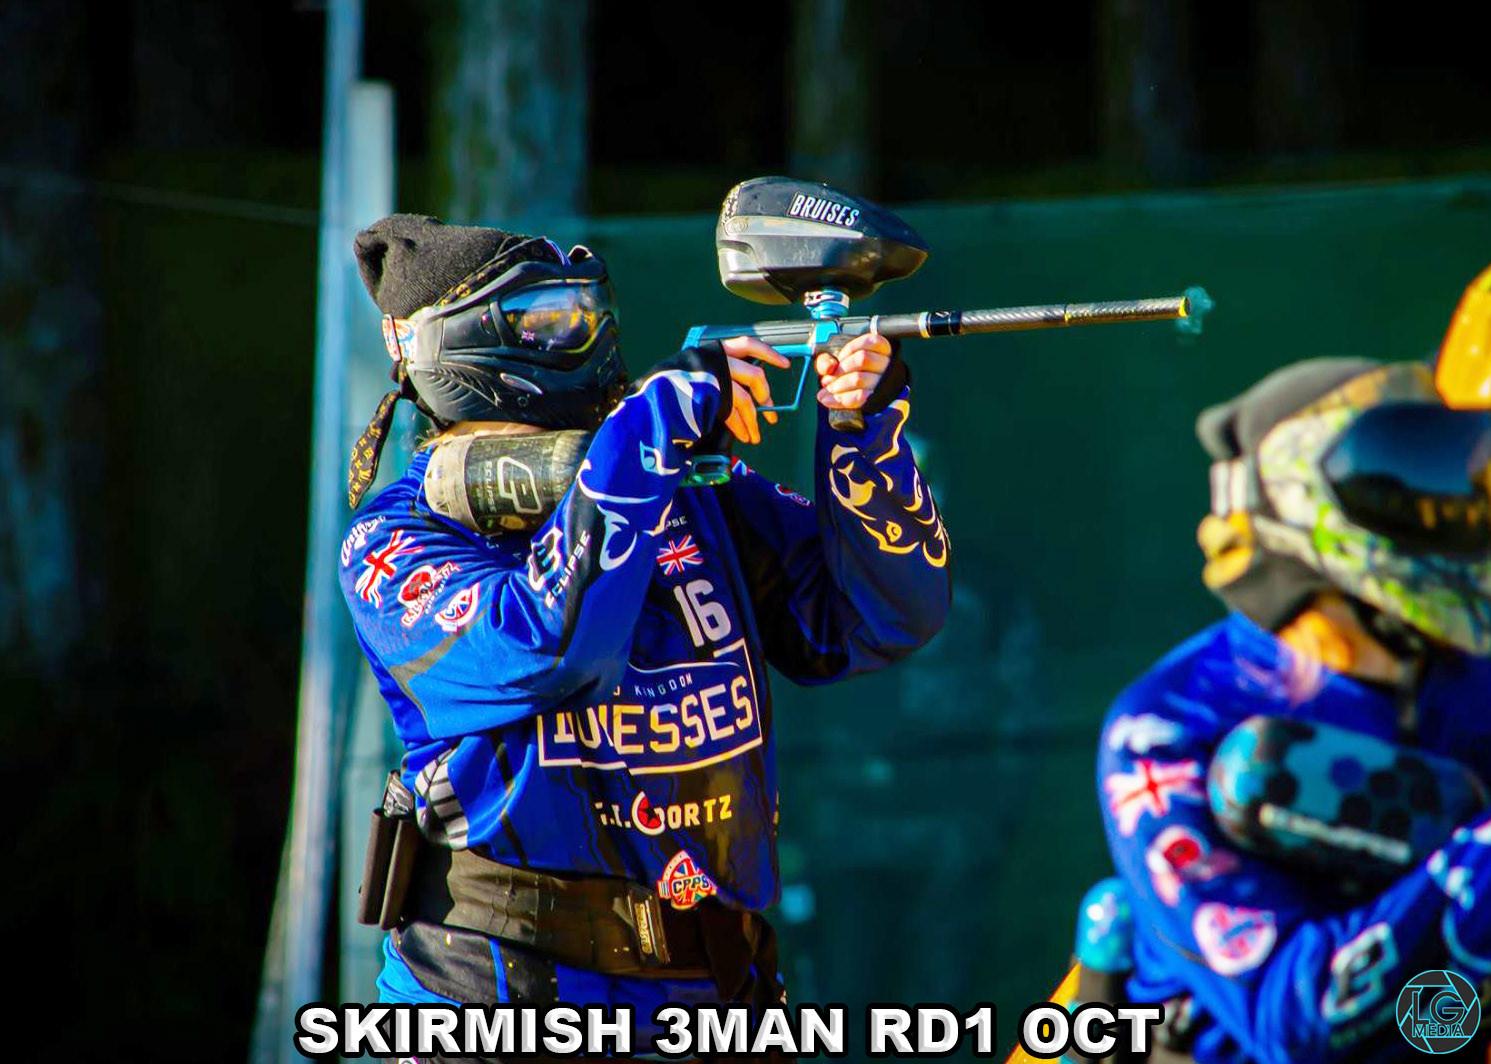 X Skirmish 3man Rd2.jpg